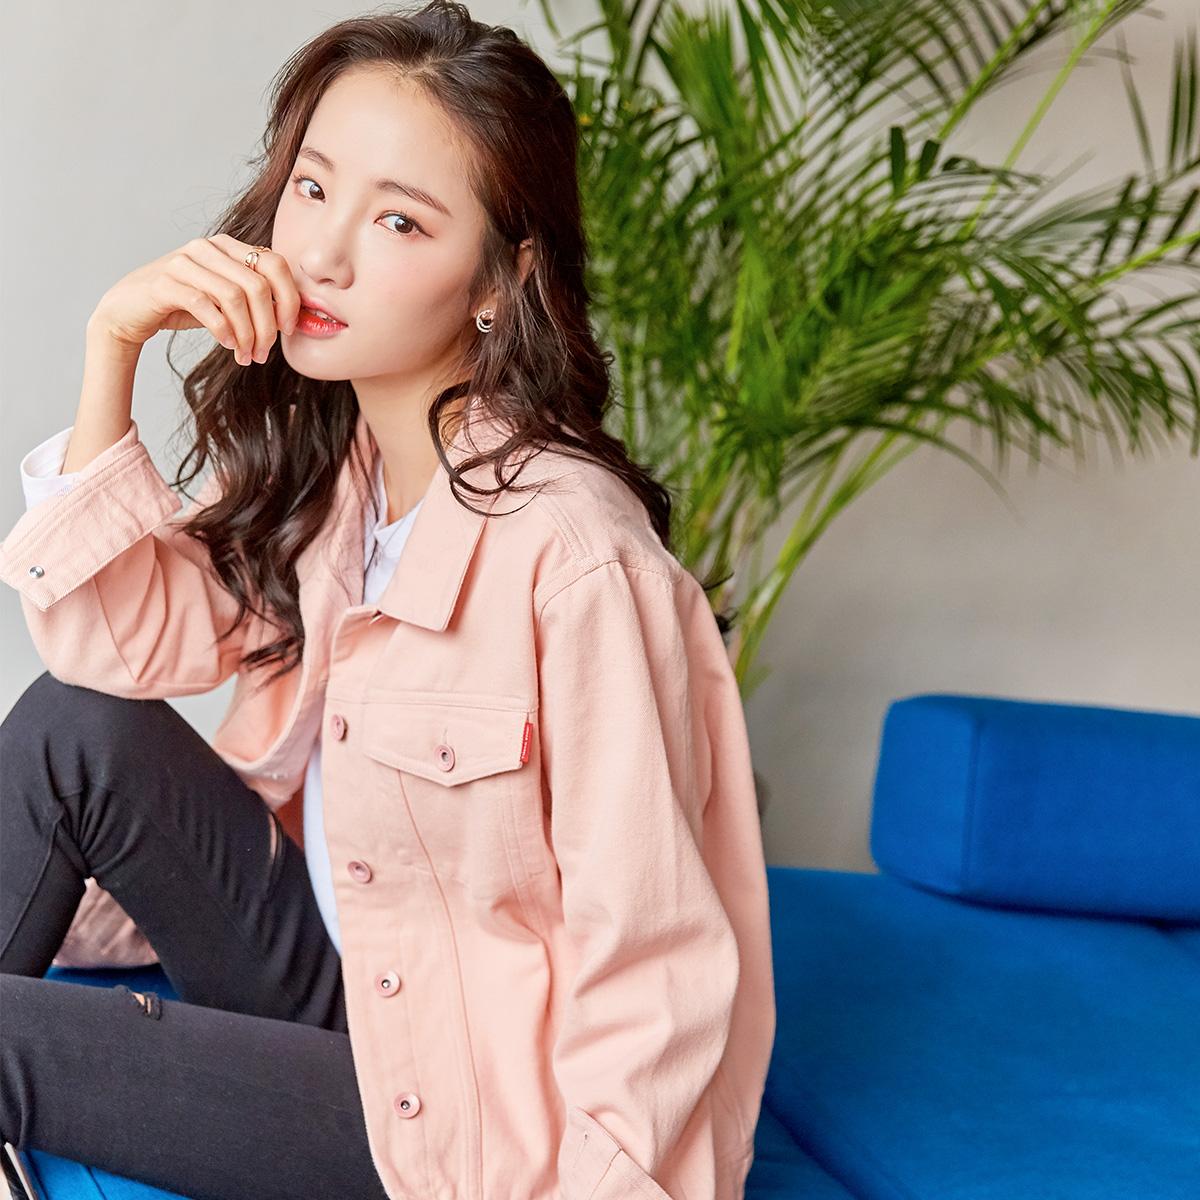 [jonaswagell旗舰店短外套]粉色牛仔外套女2019新款春装韩版宽月销量999件仅售189元